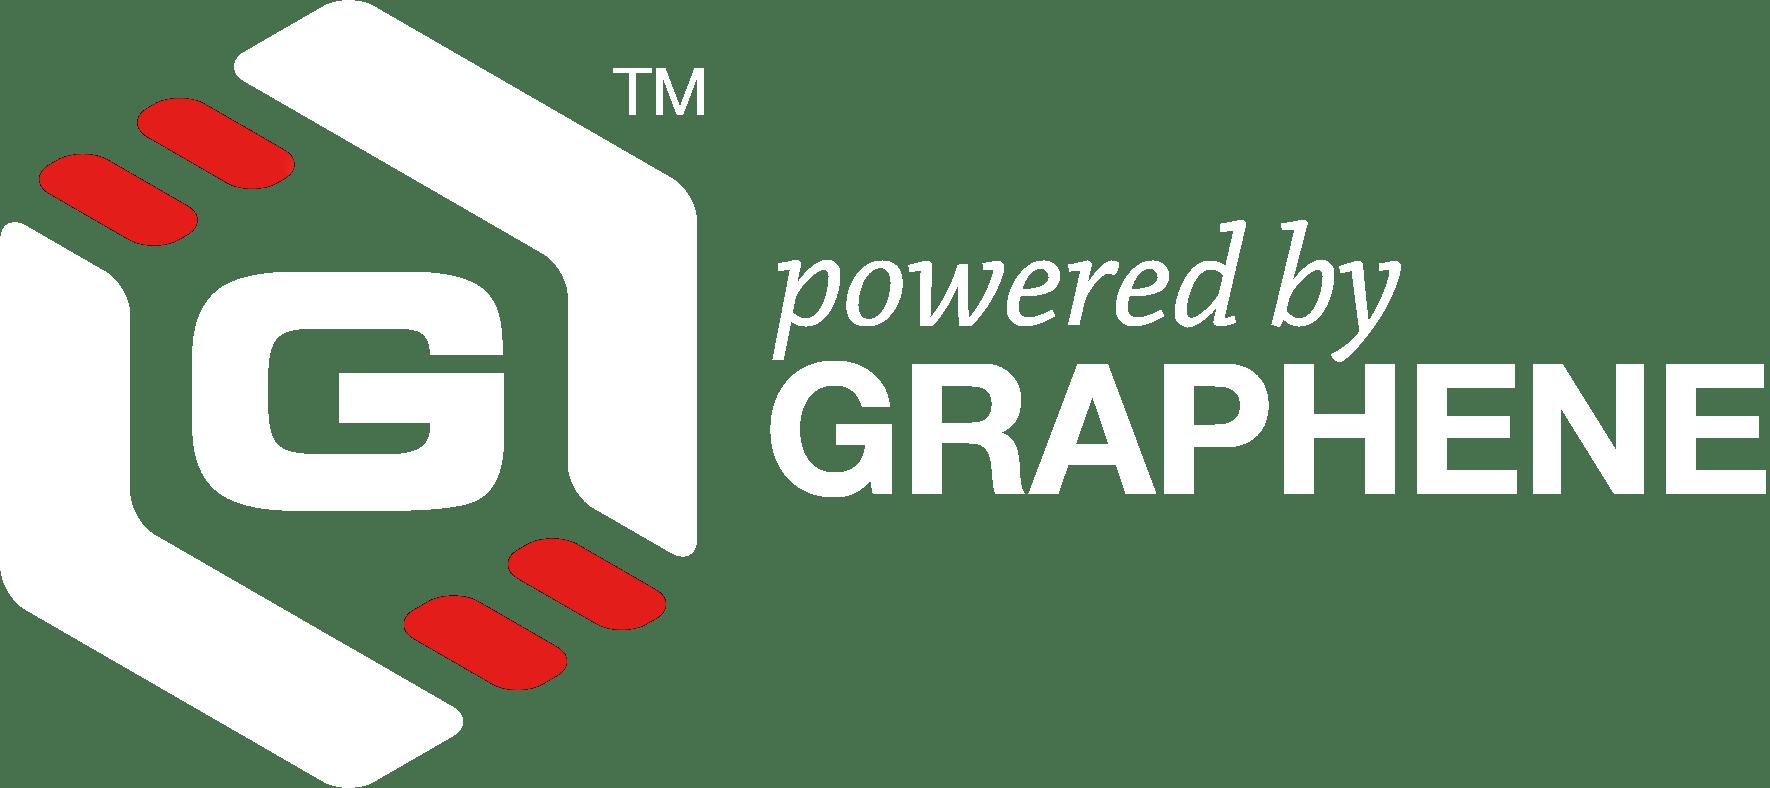 Graphen 2.0